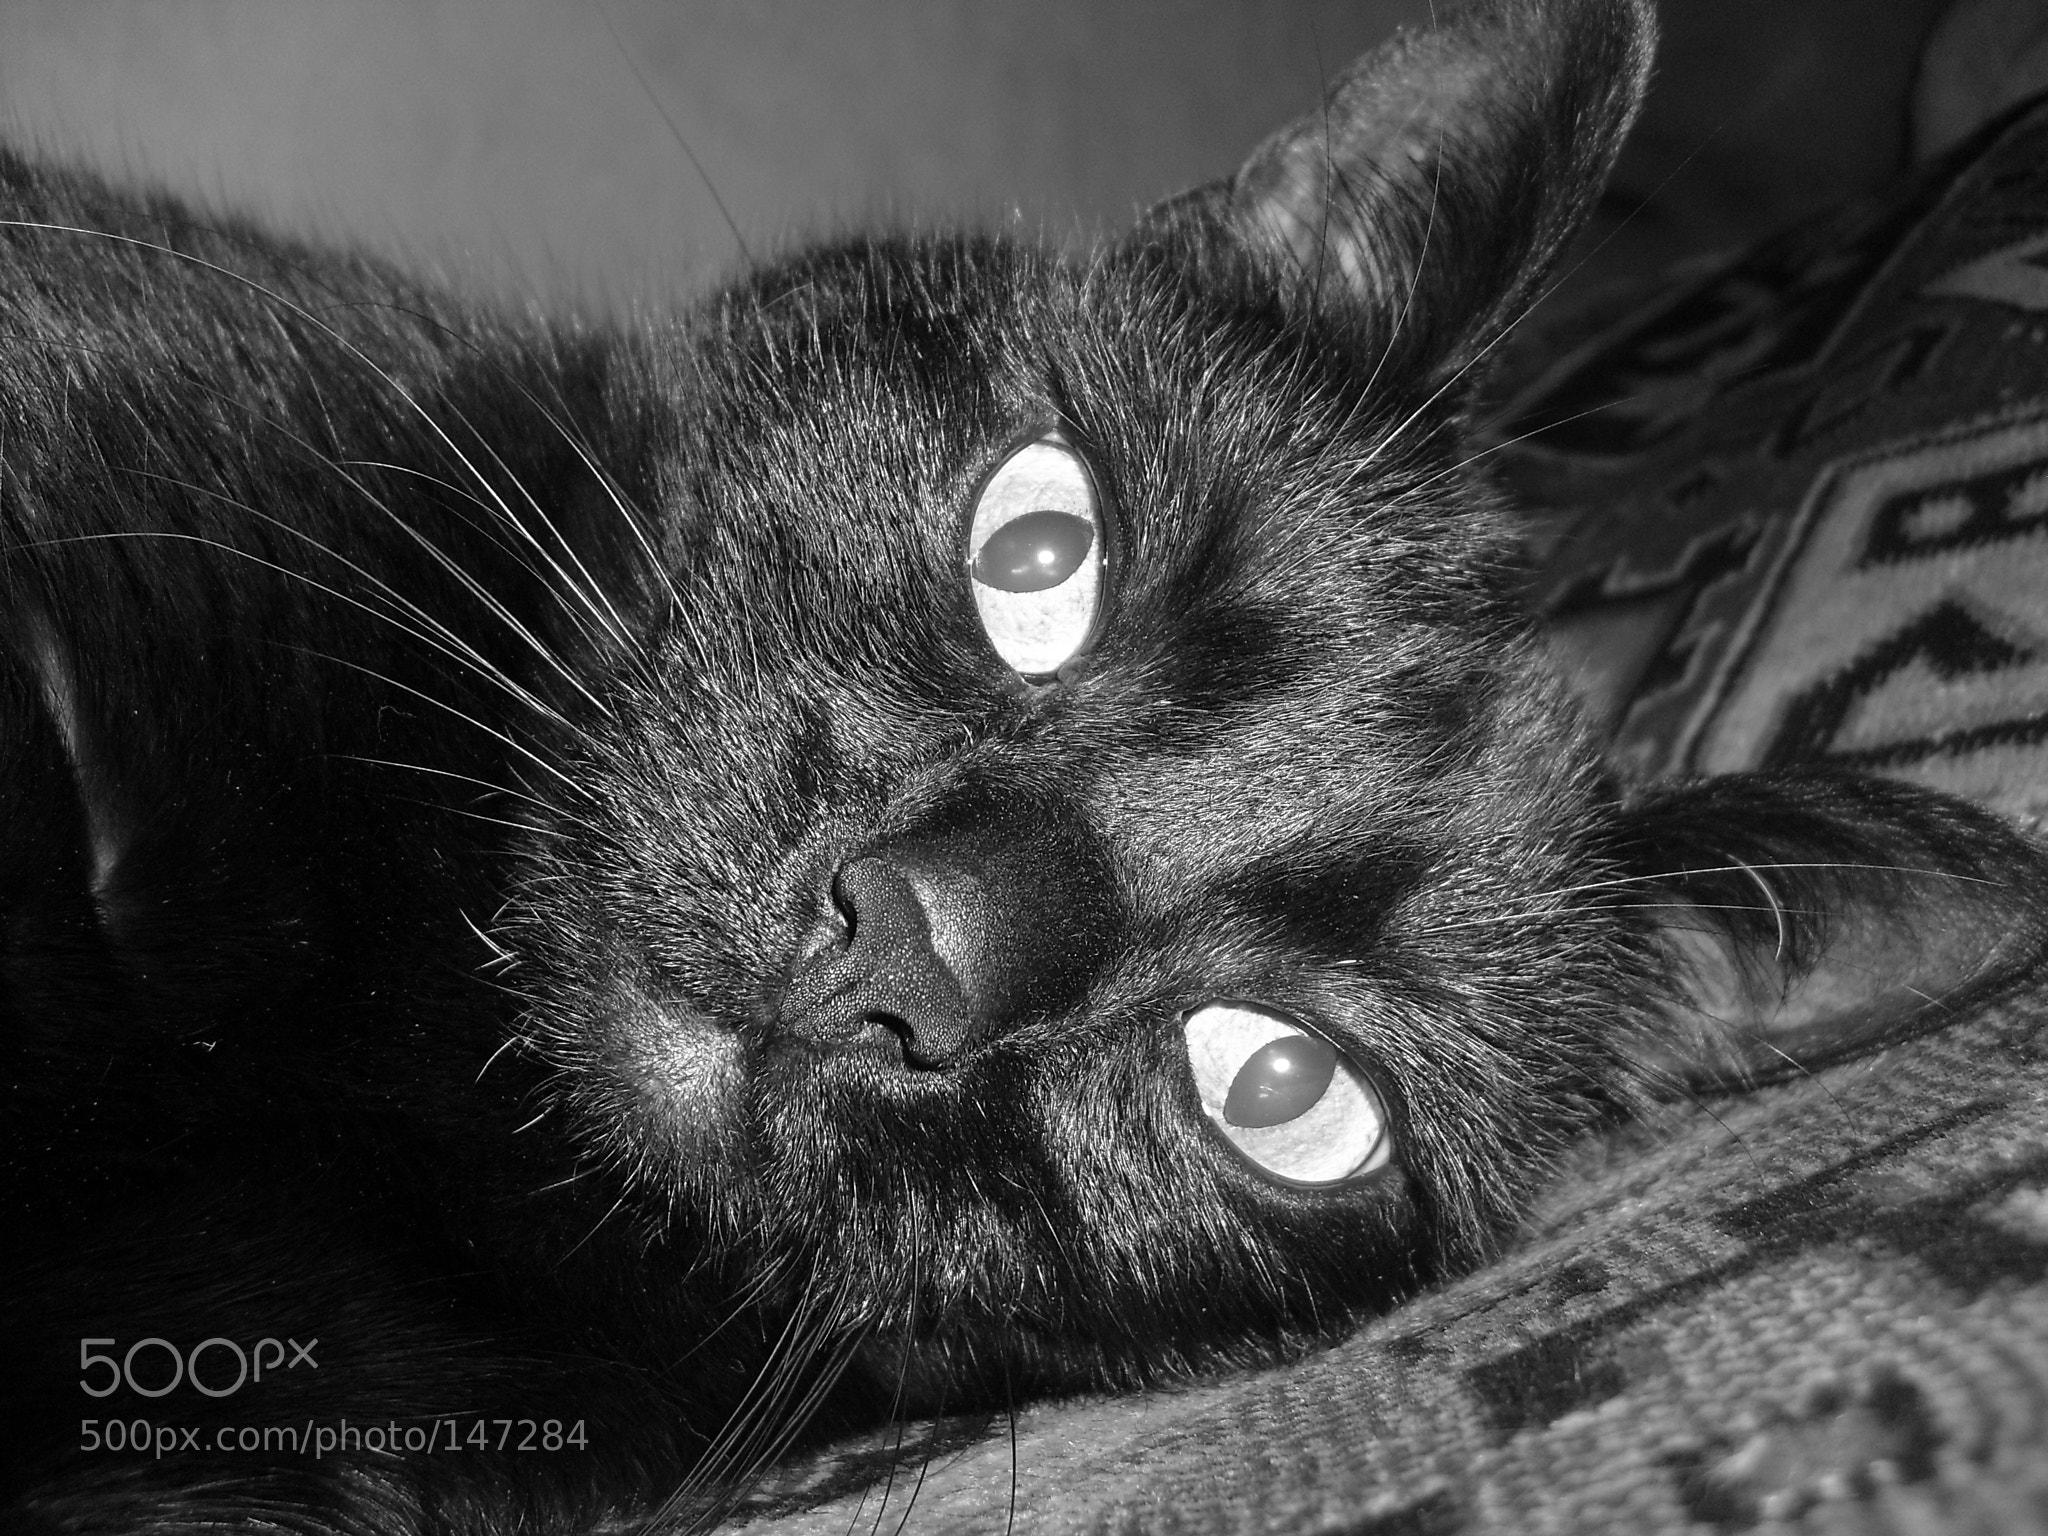 Photograph Cat by Lusia Kruzenshtern on 500px